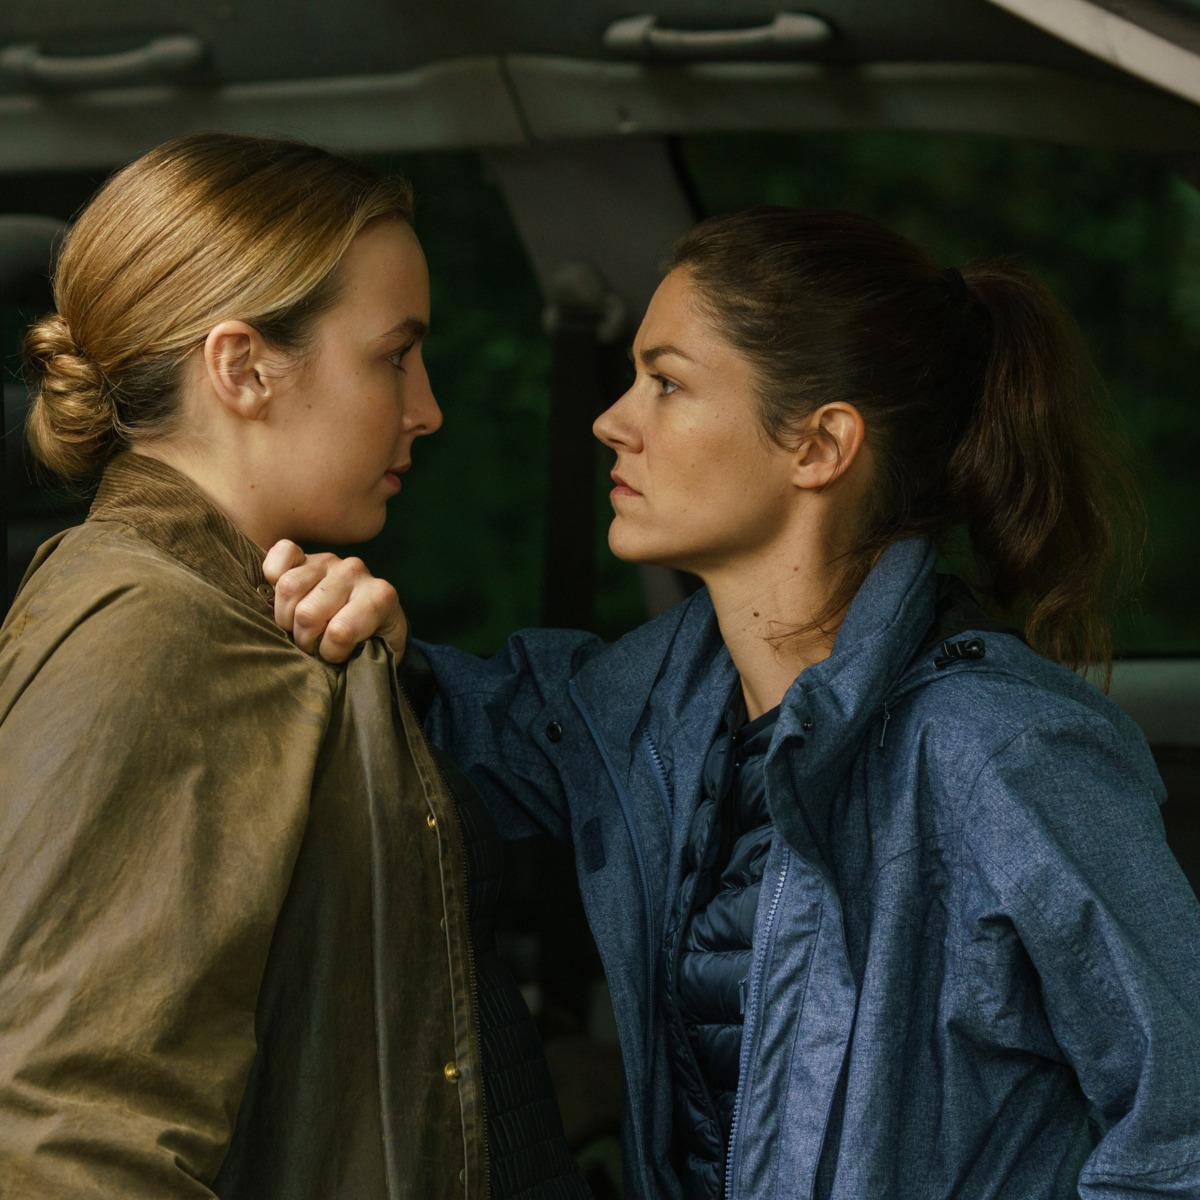 Killing Eve Recap Season 1 Episode 4: 'Sorry Baby'